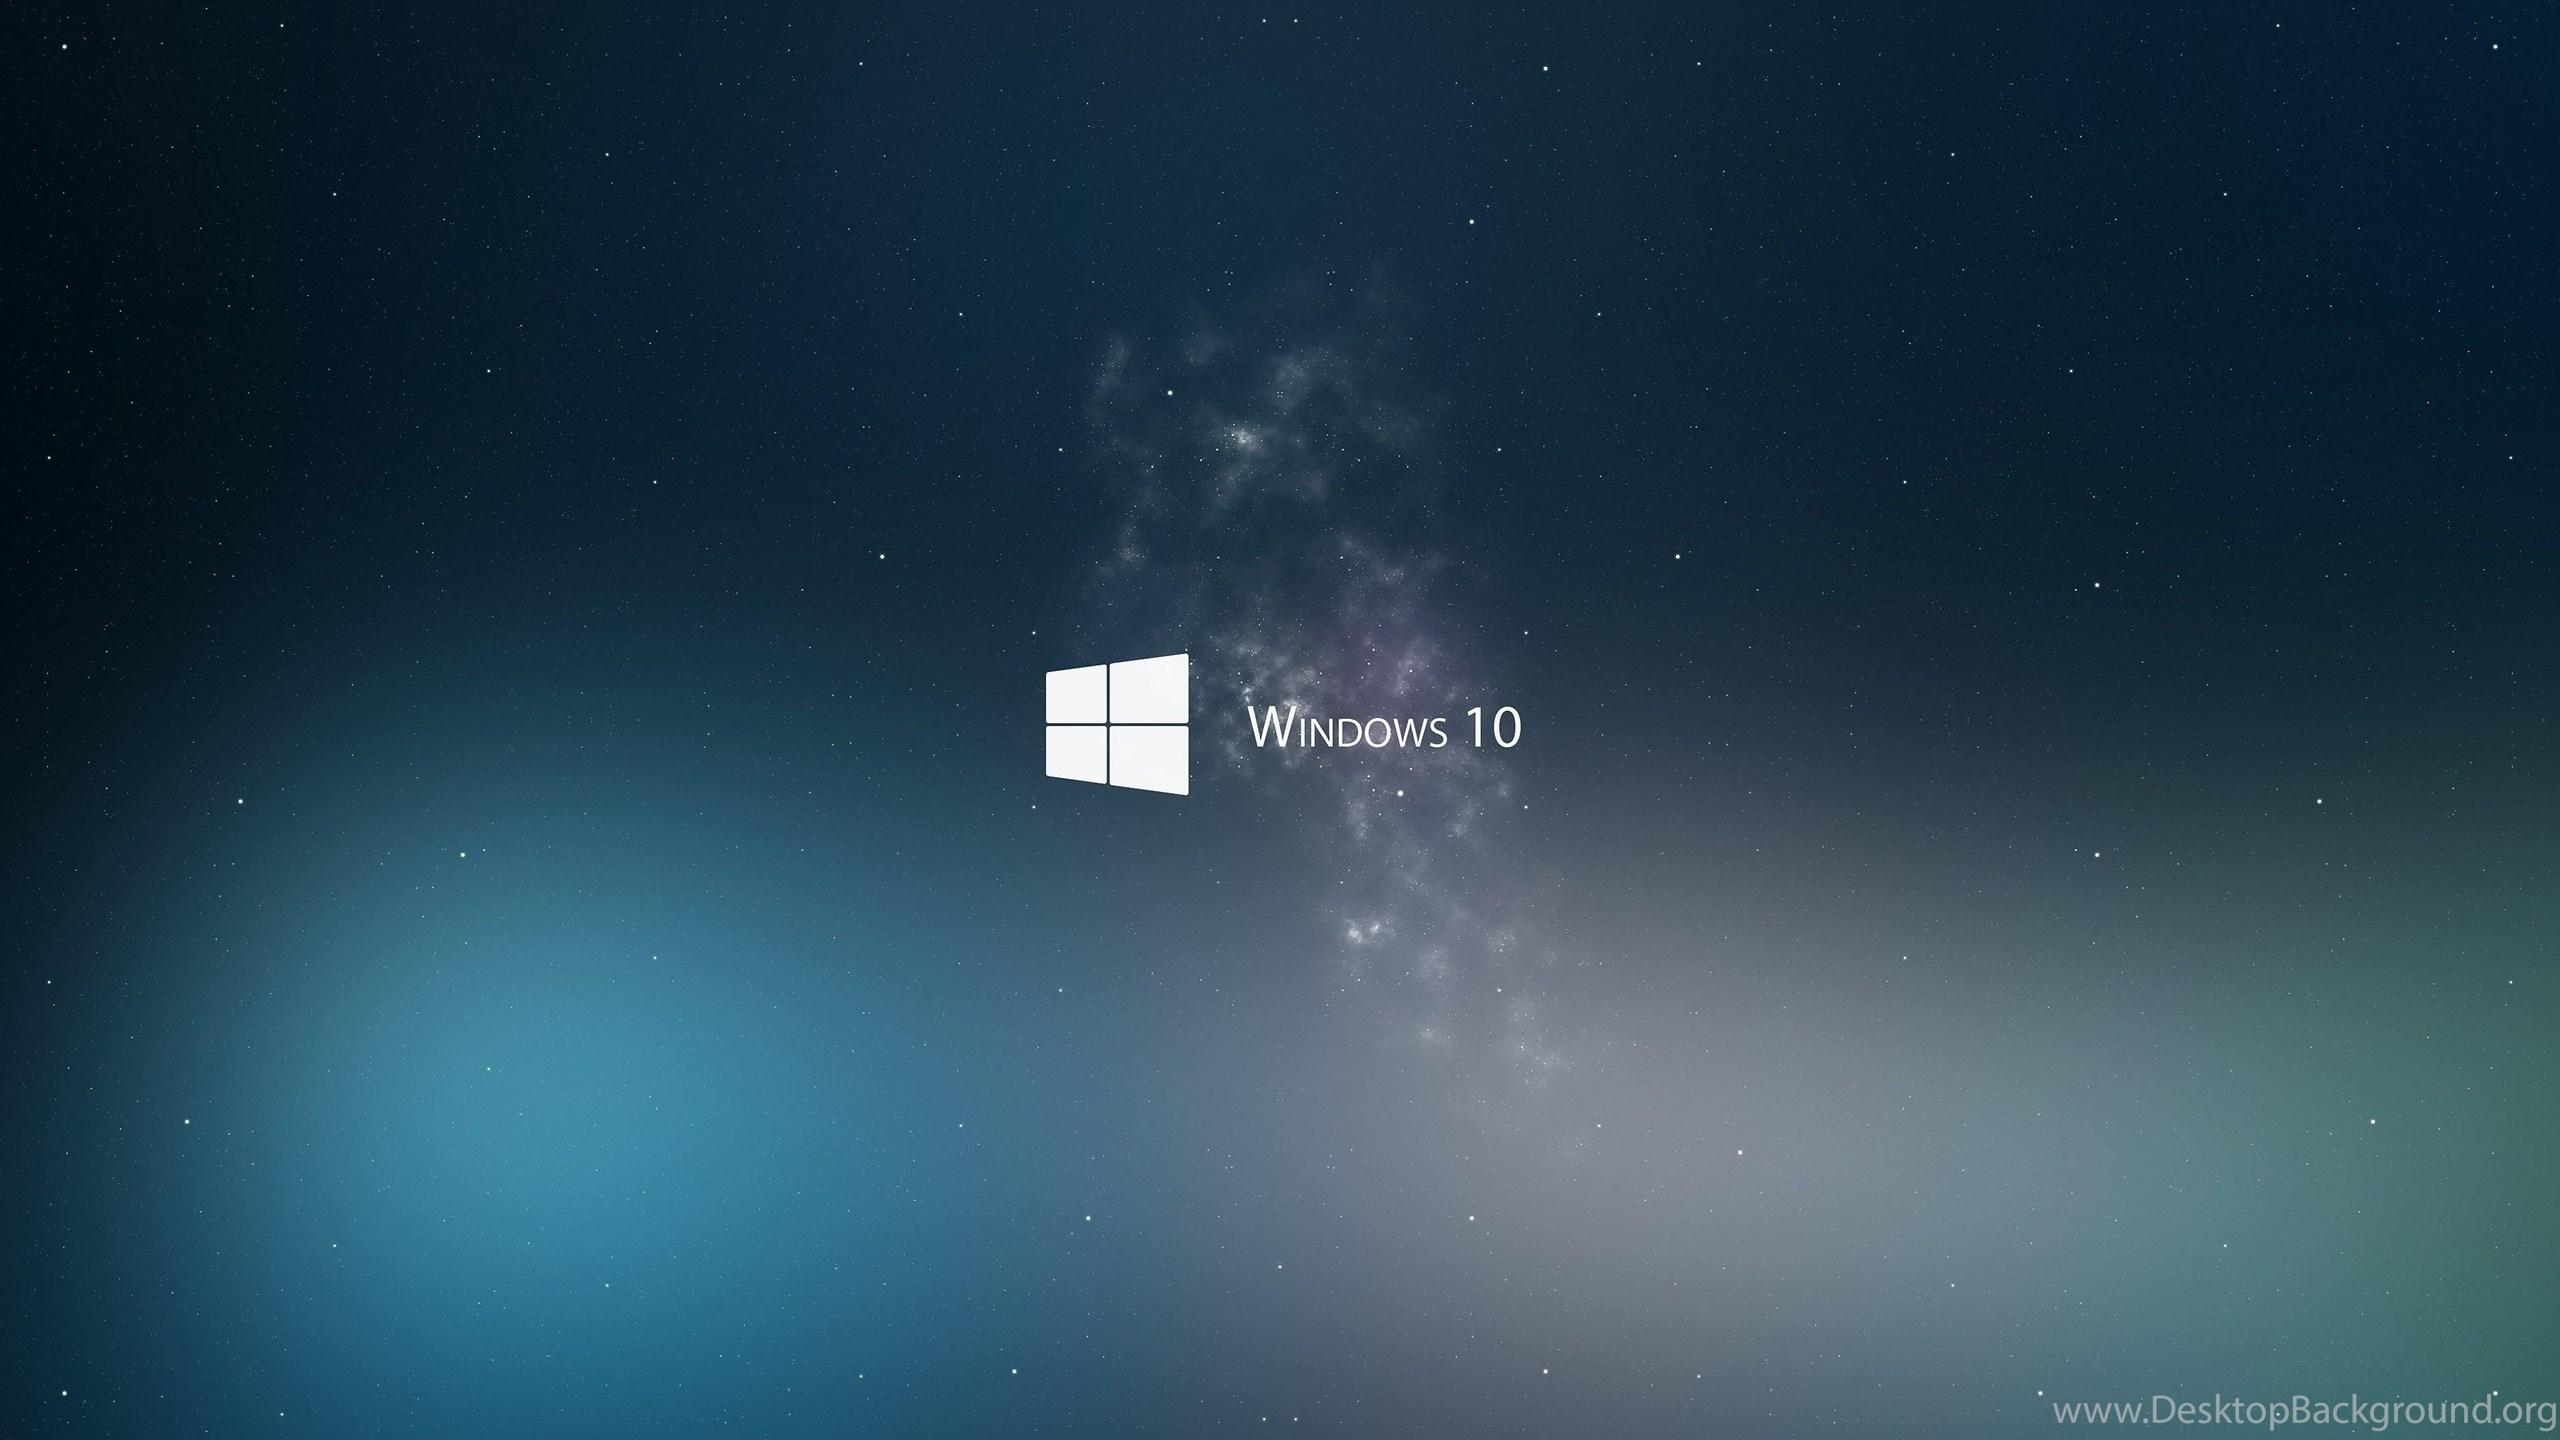 white windows 10 logo in space 4k wallpapers desktop background